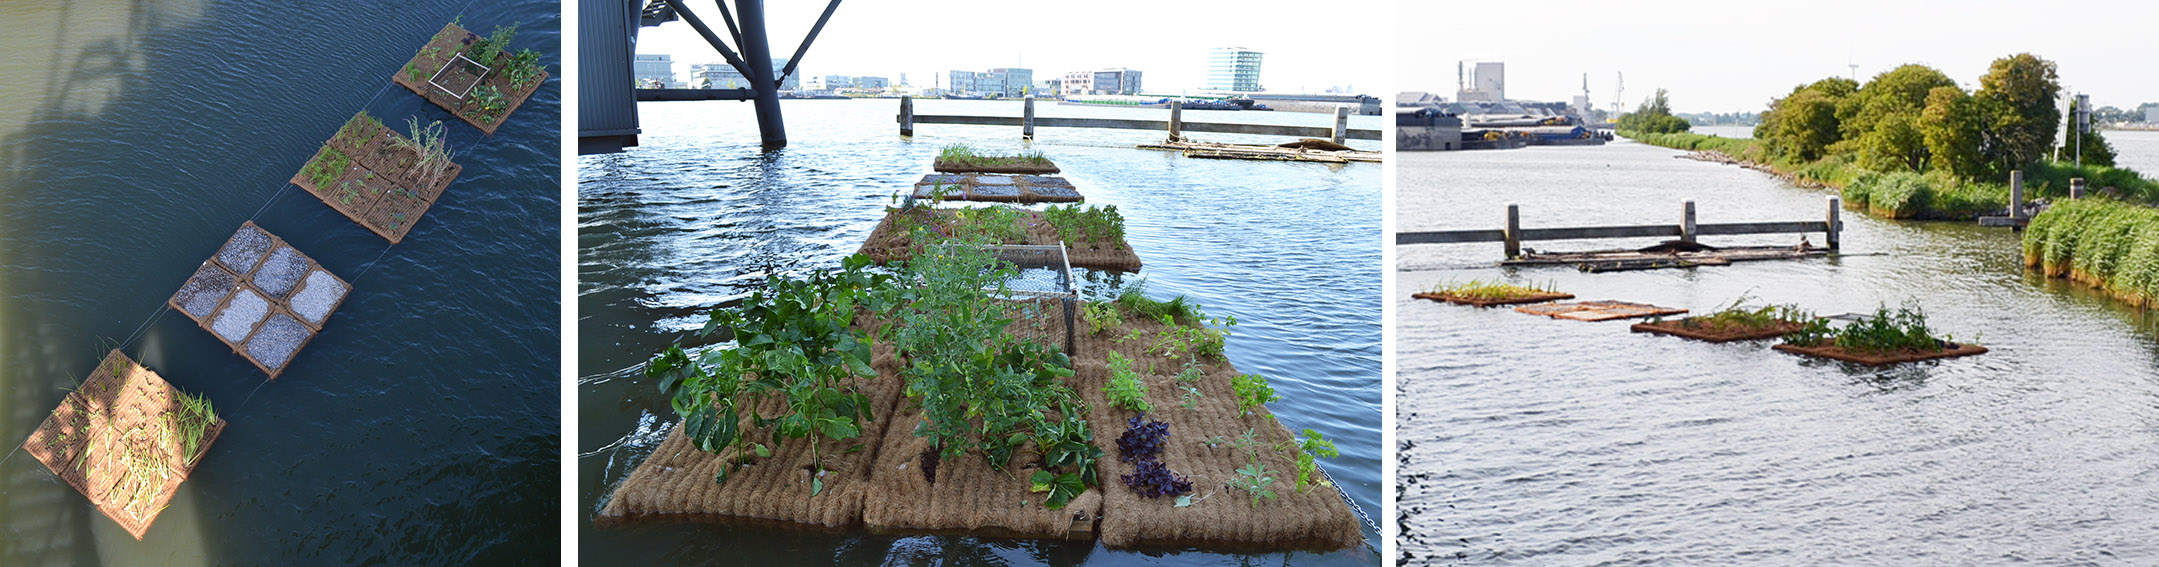 drijvende eilanden Amsterdam, Helkantplant